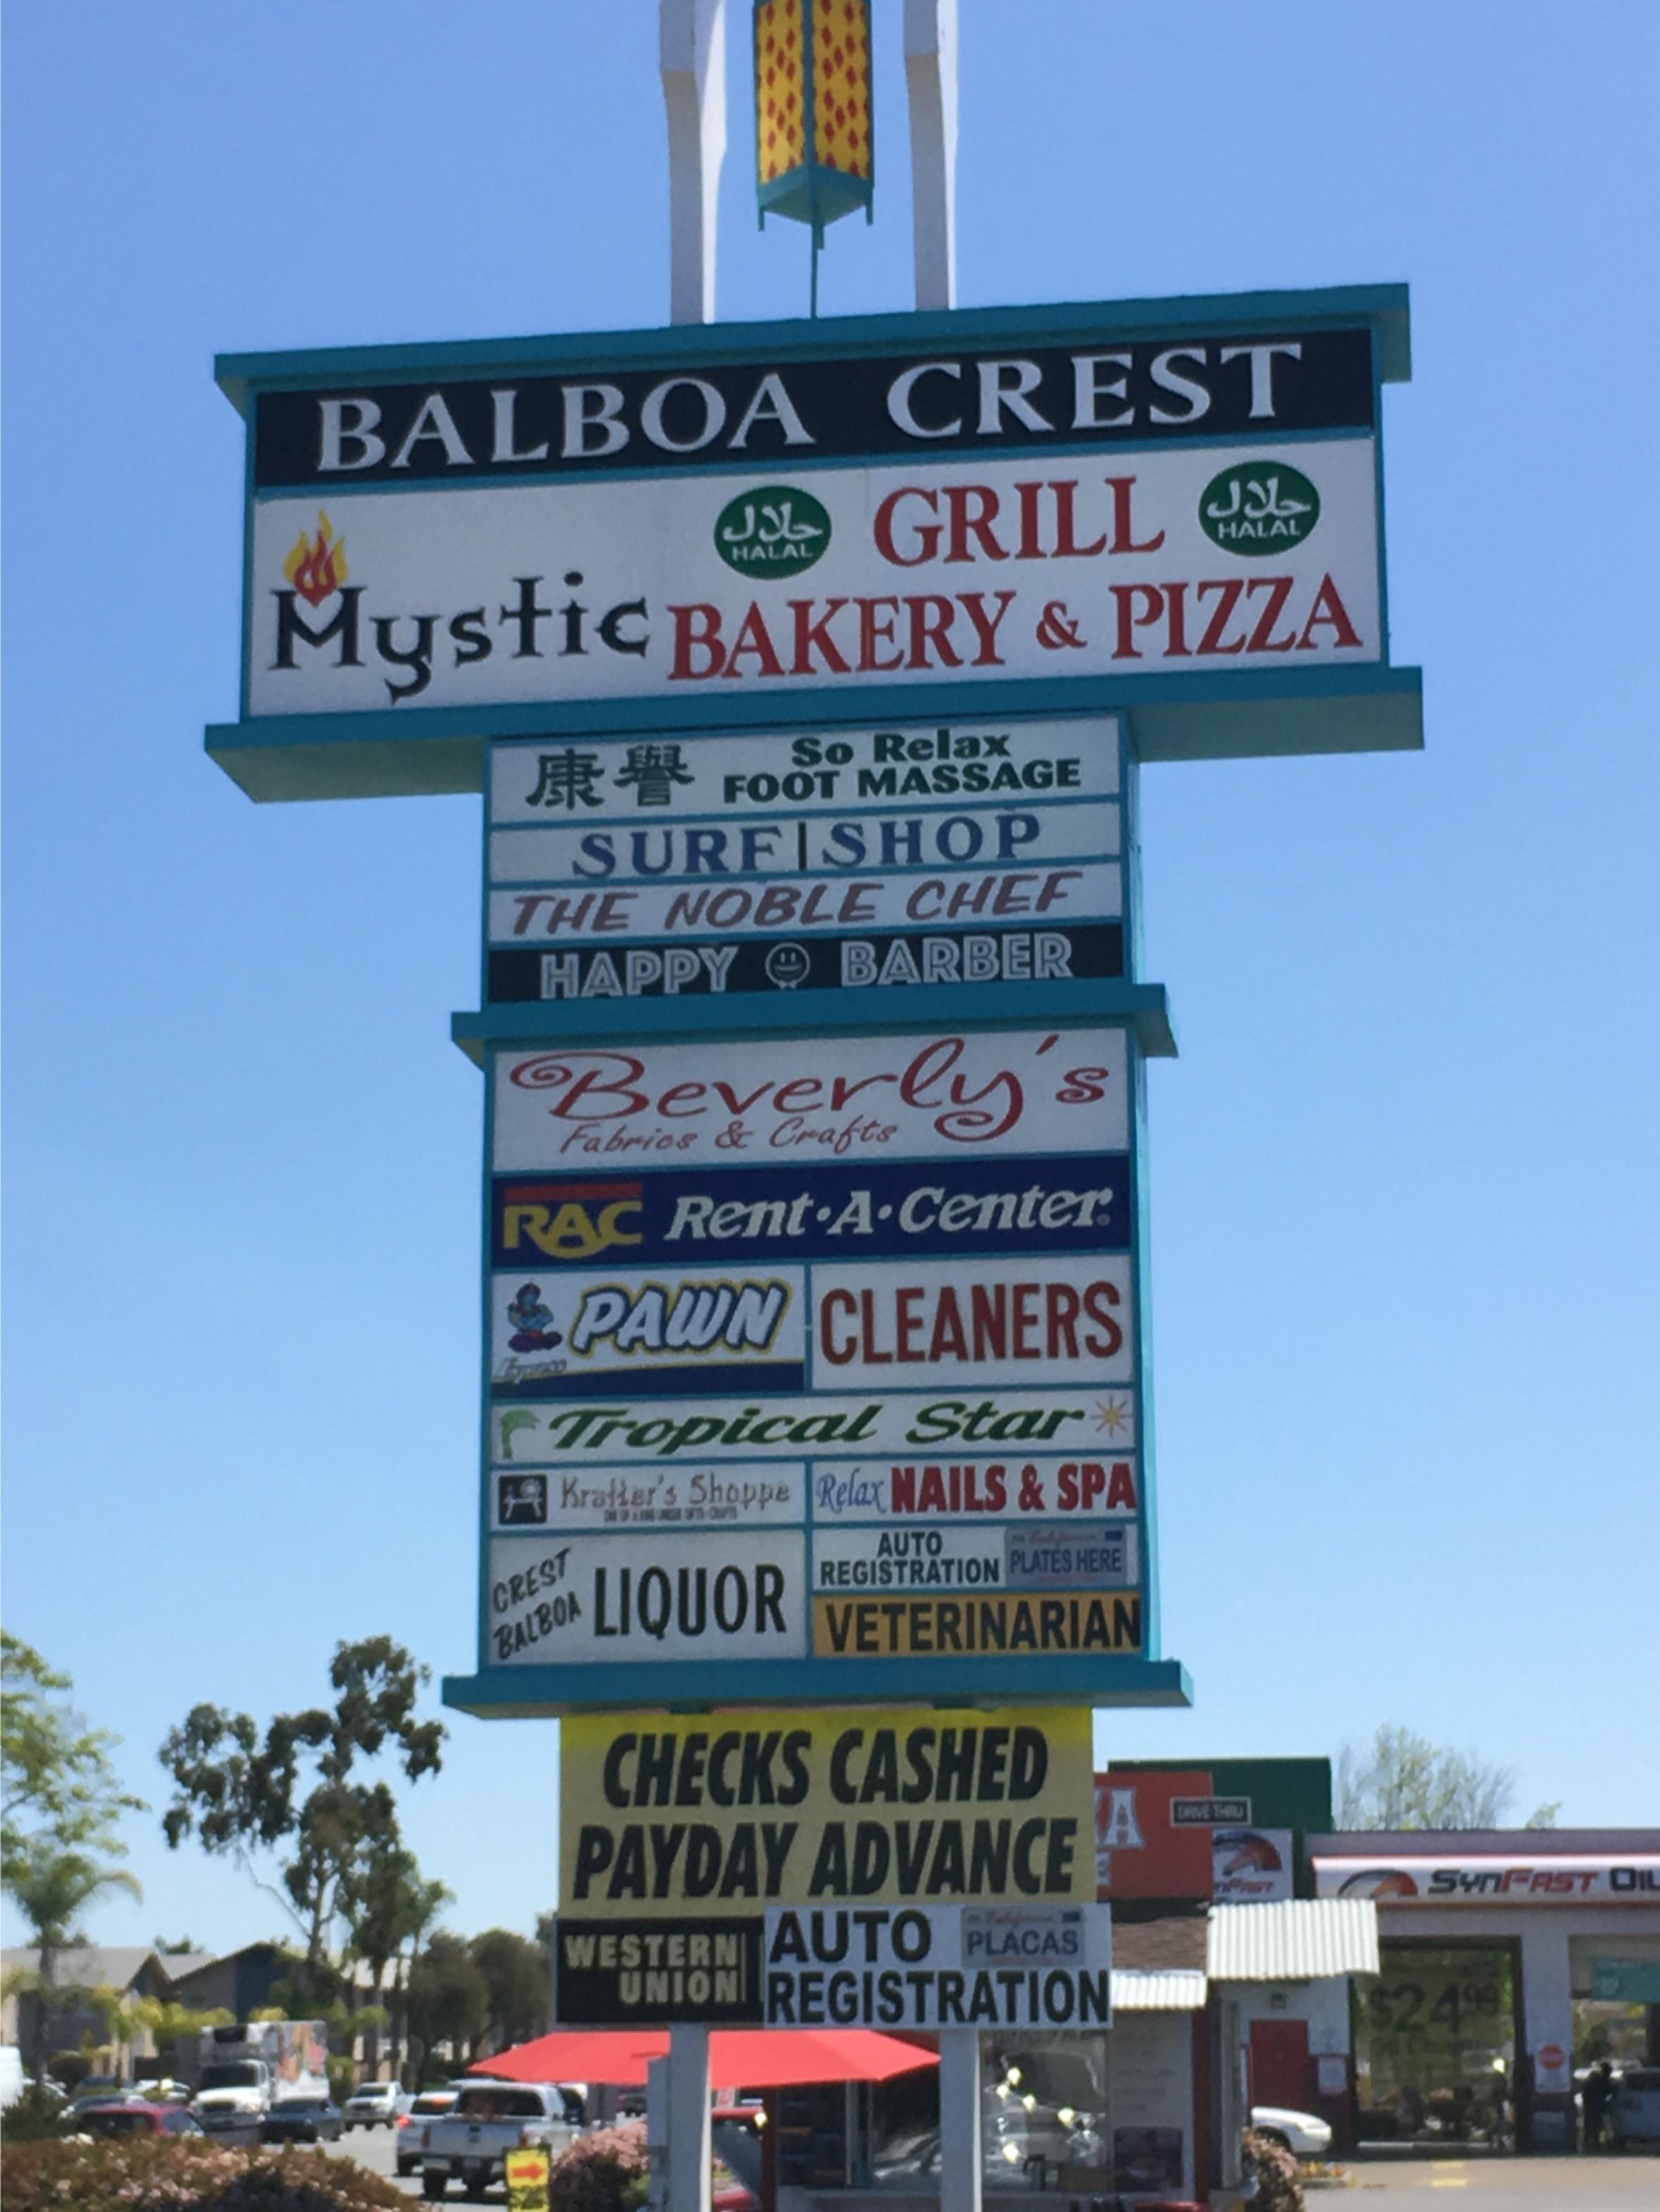 Balboa Crest Main Pic 4.17.18